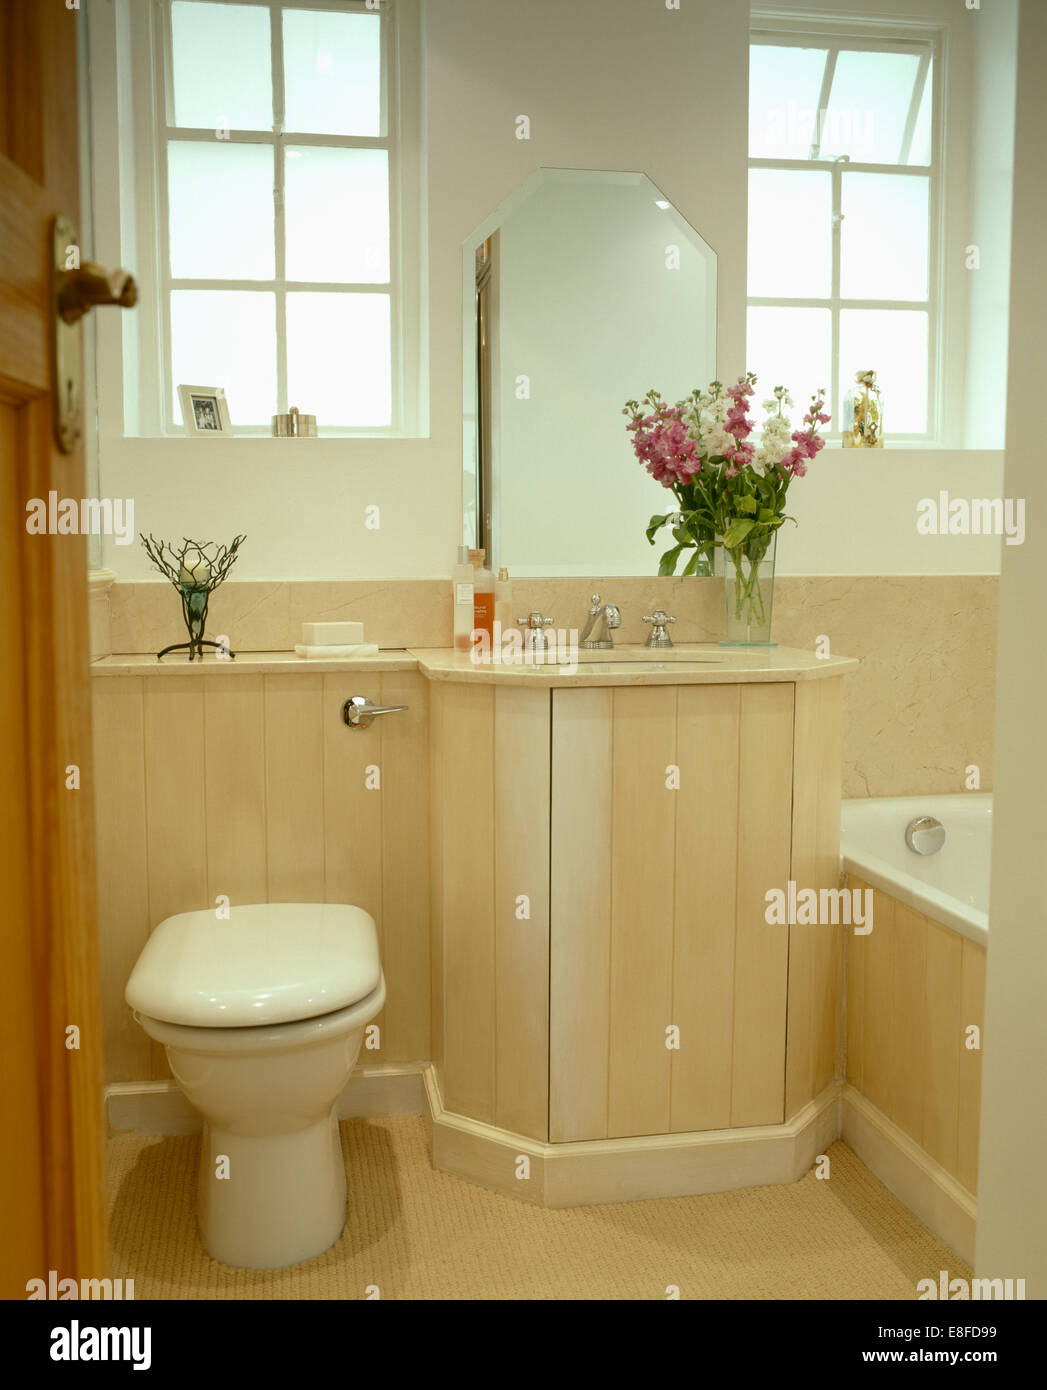 Modern Bathroom Toilet Beside Basin In Vanity Unit With Pale Wood Stock Photo Alamy